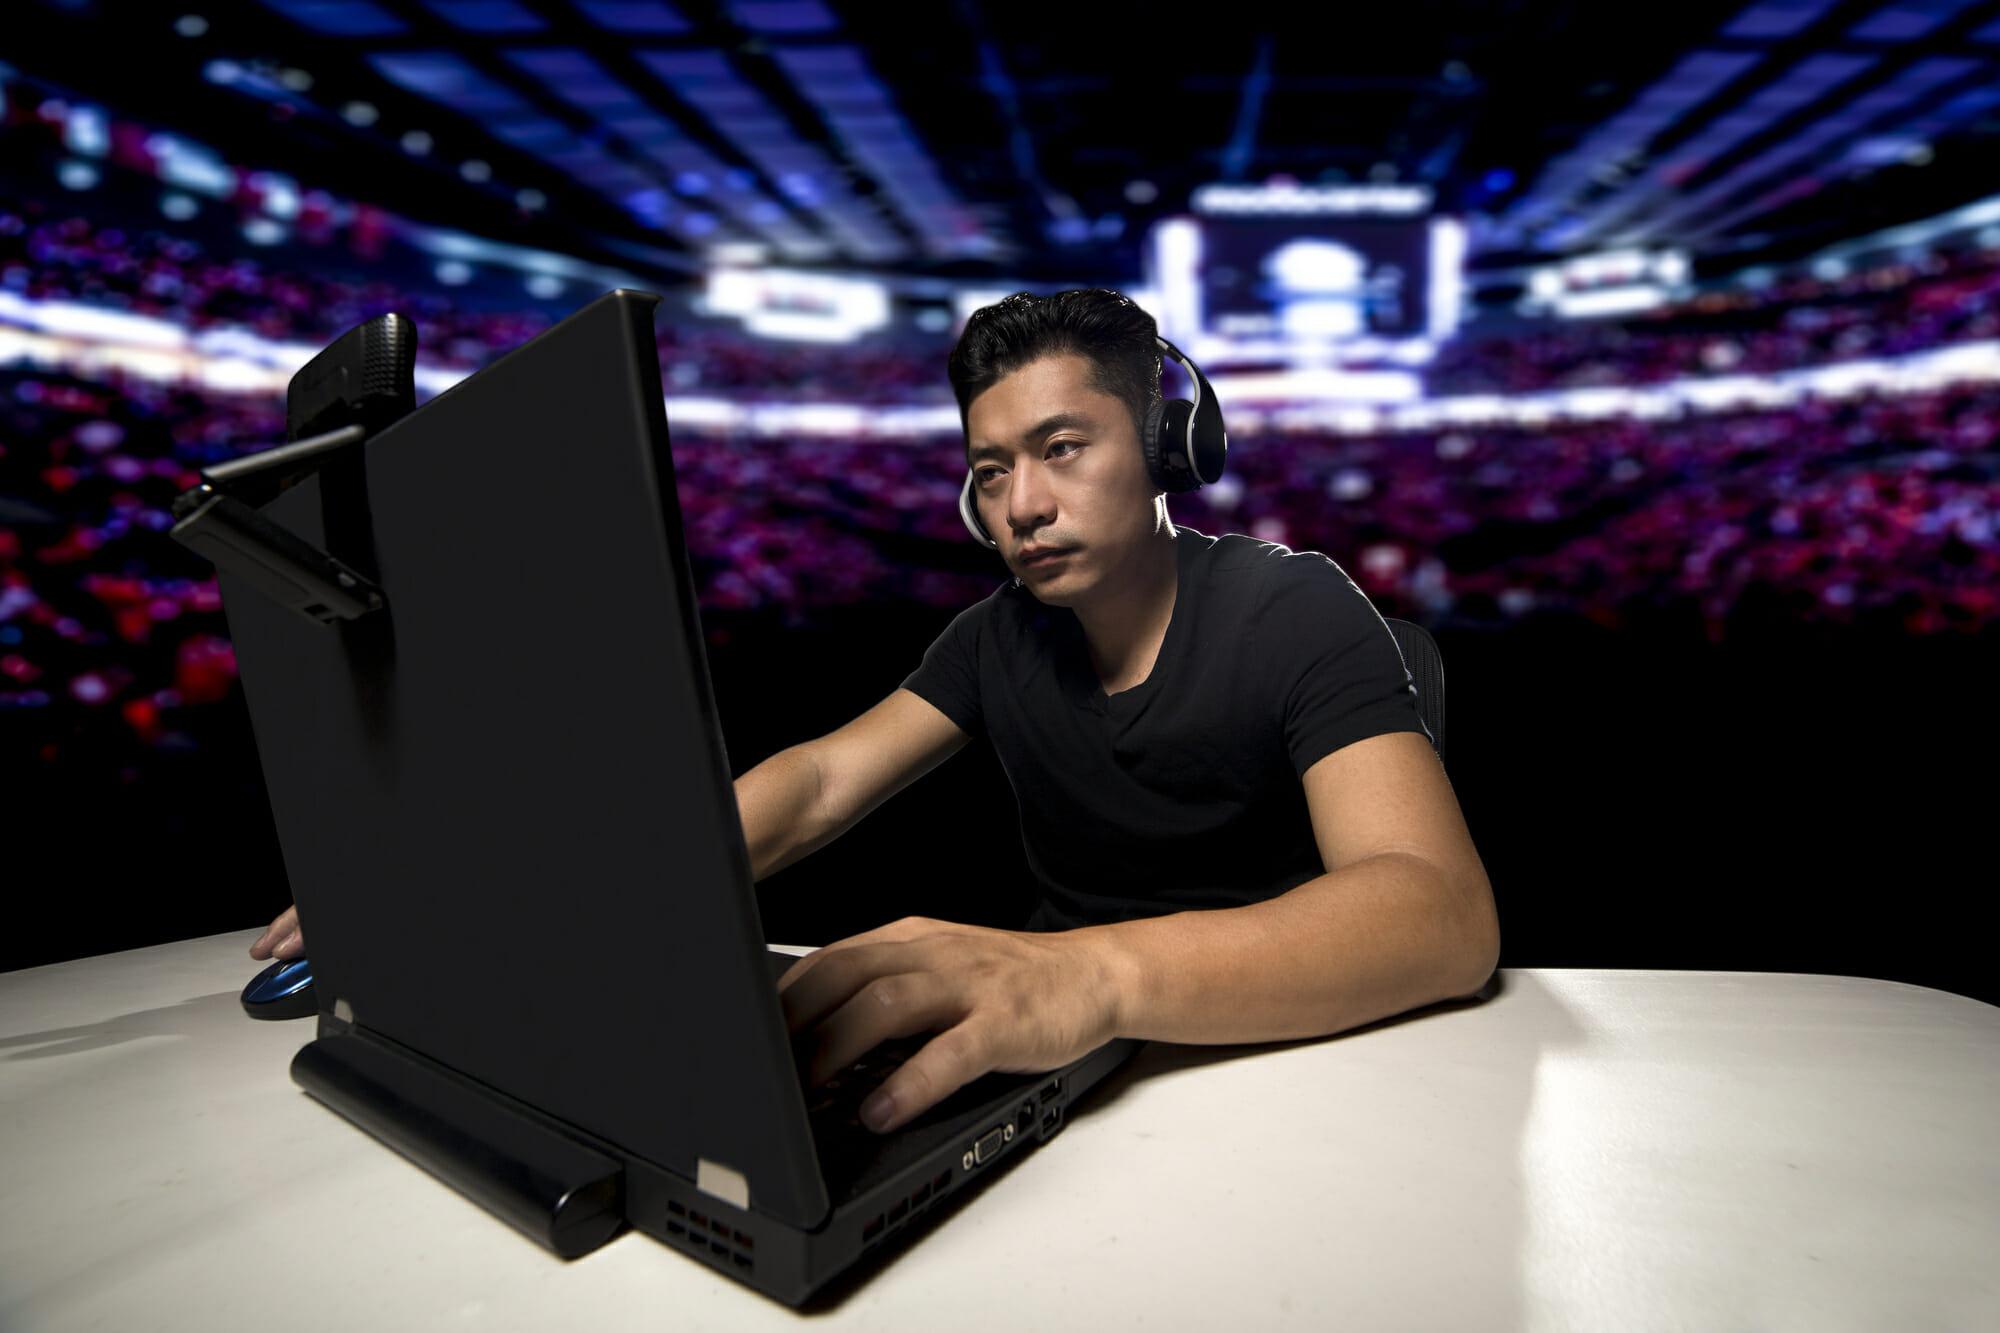 eSports Competitive Gamer in a Stadium Coaching LoL Team